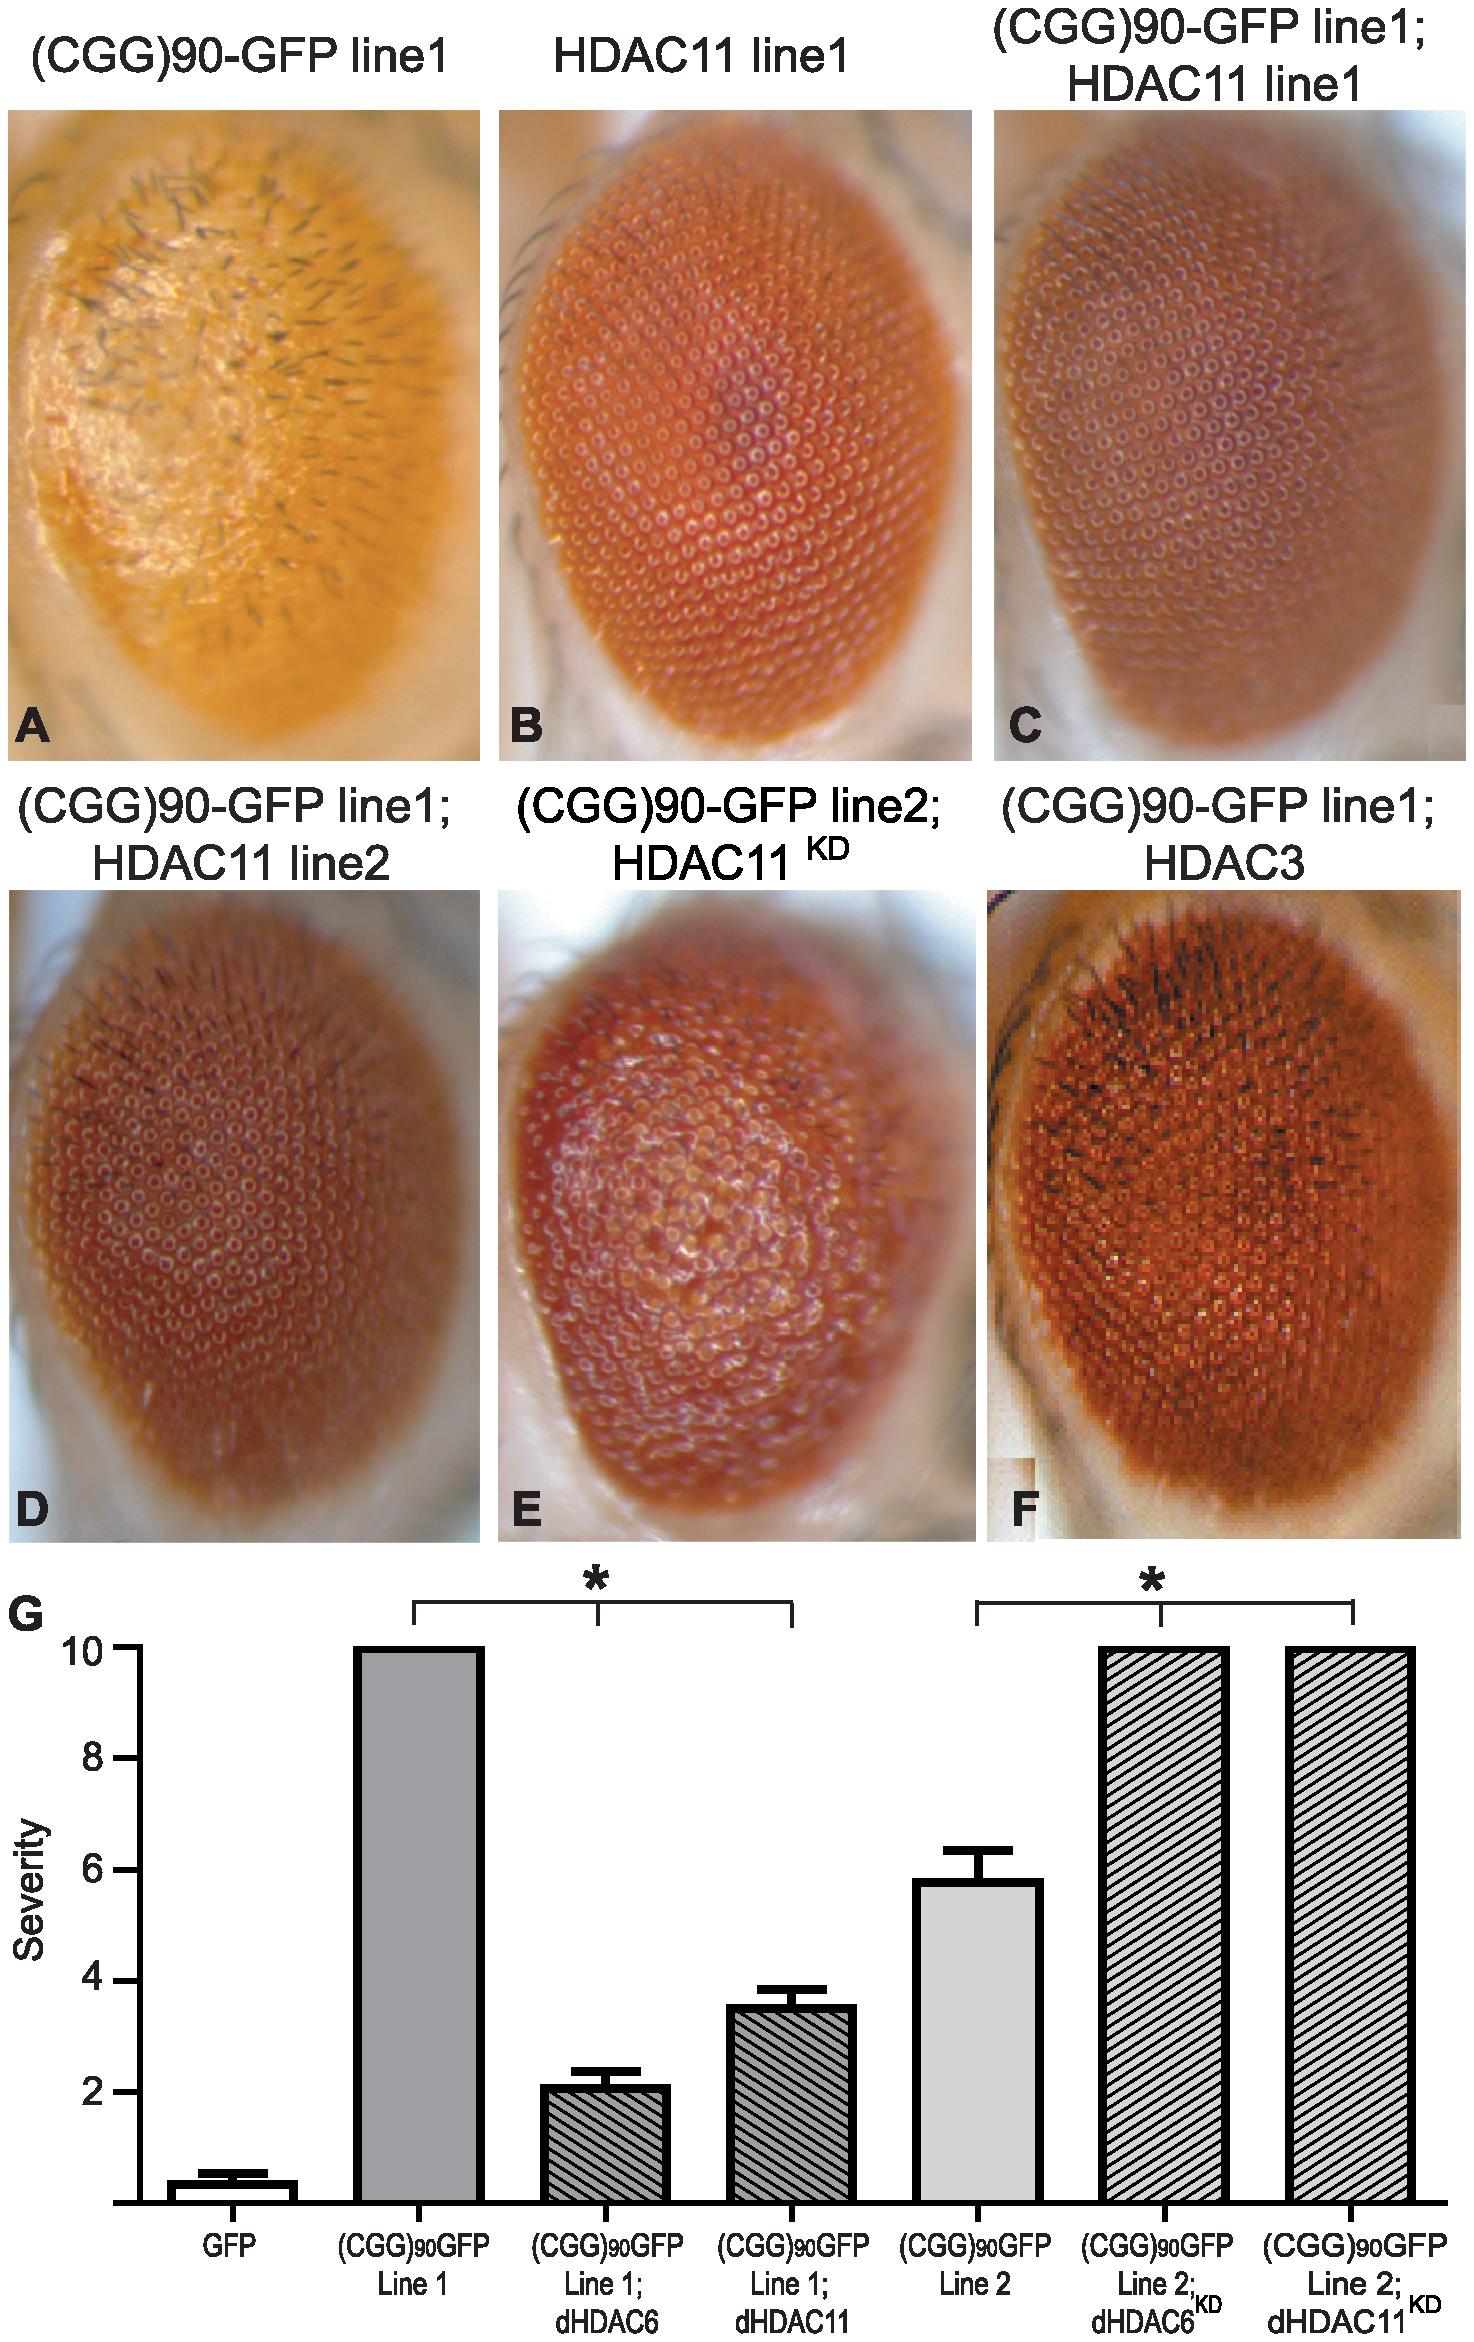 HDAC3 and HDAC11 also suppress (CGG)<sub>90</sub>-eGFP mRNA–induced neurodegeneration.